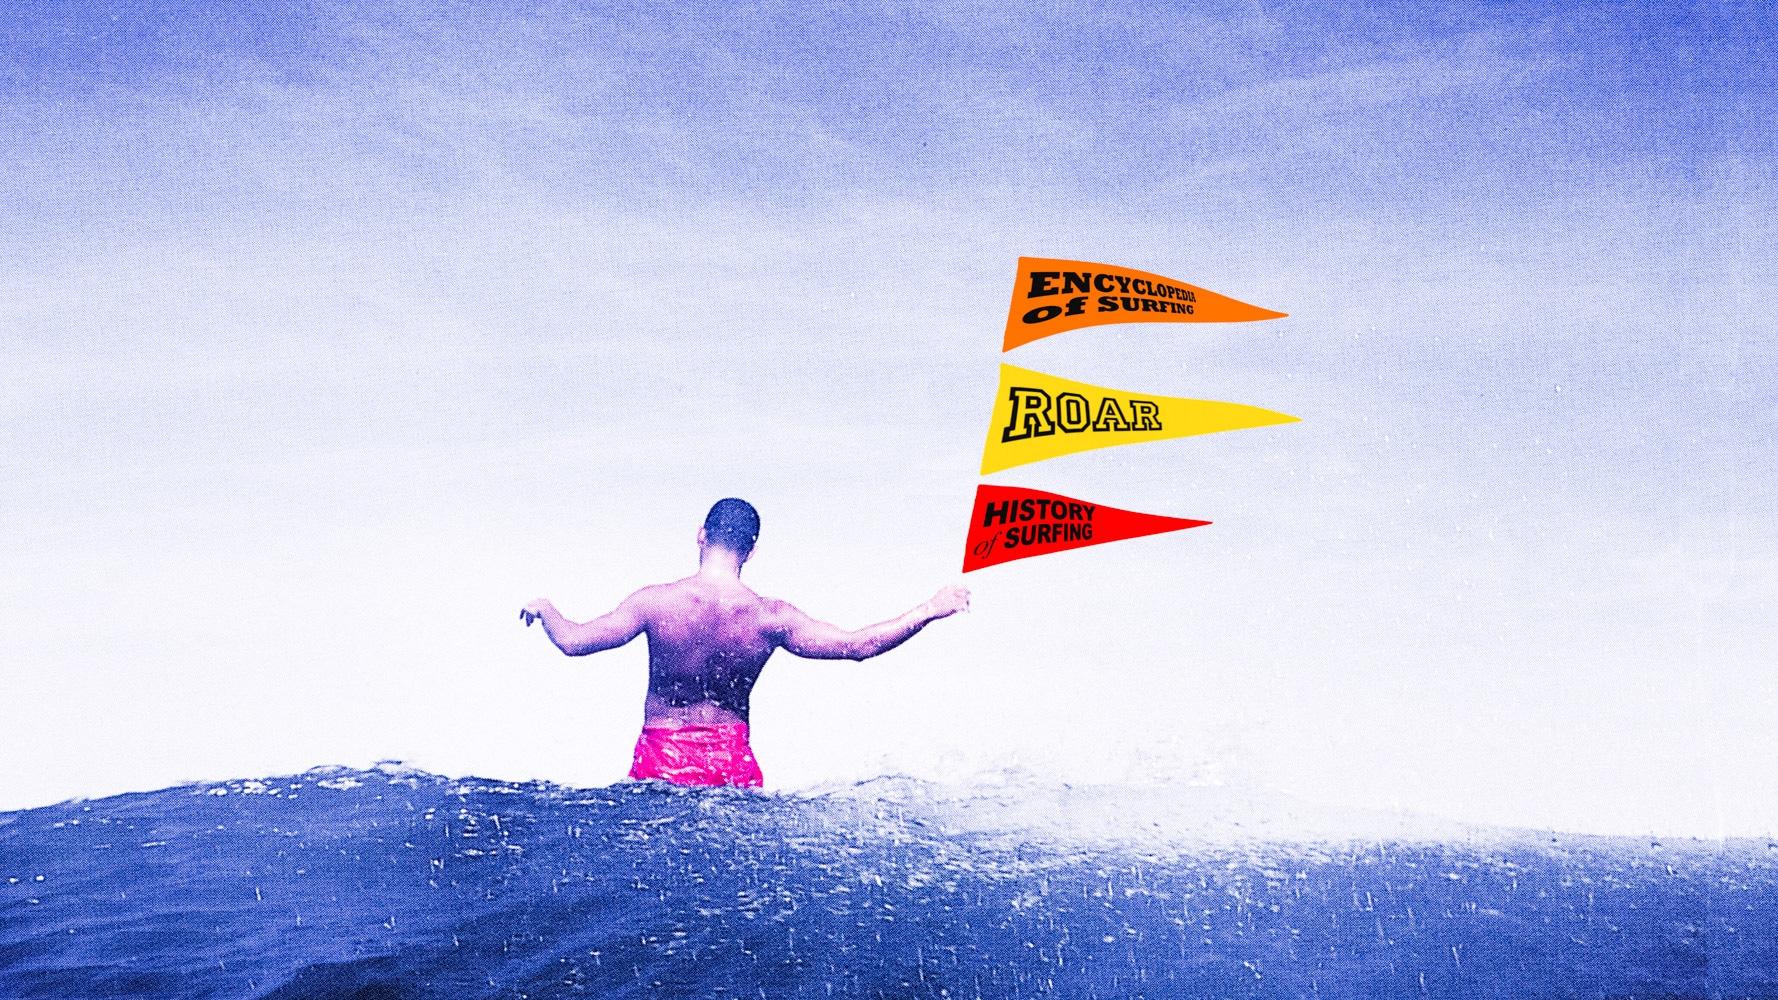 Encyclopedia of Surfing by Matt Warshaw